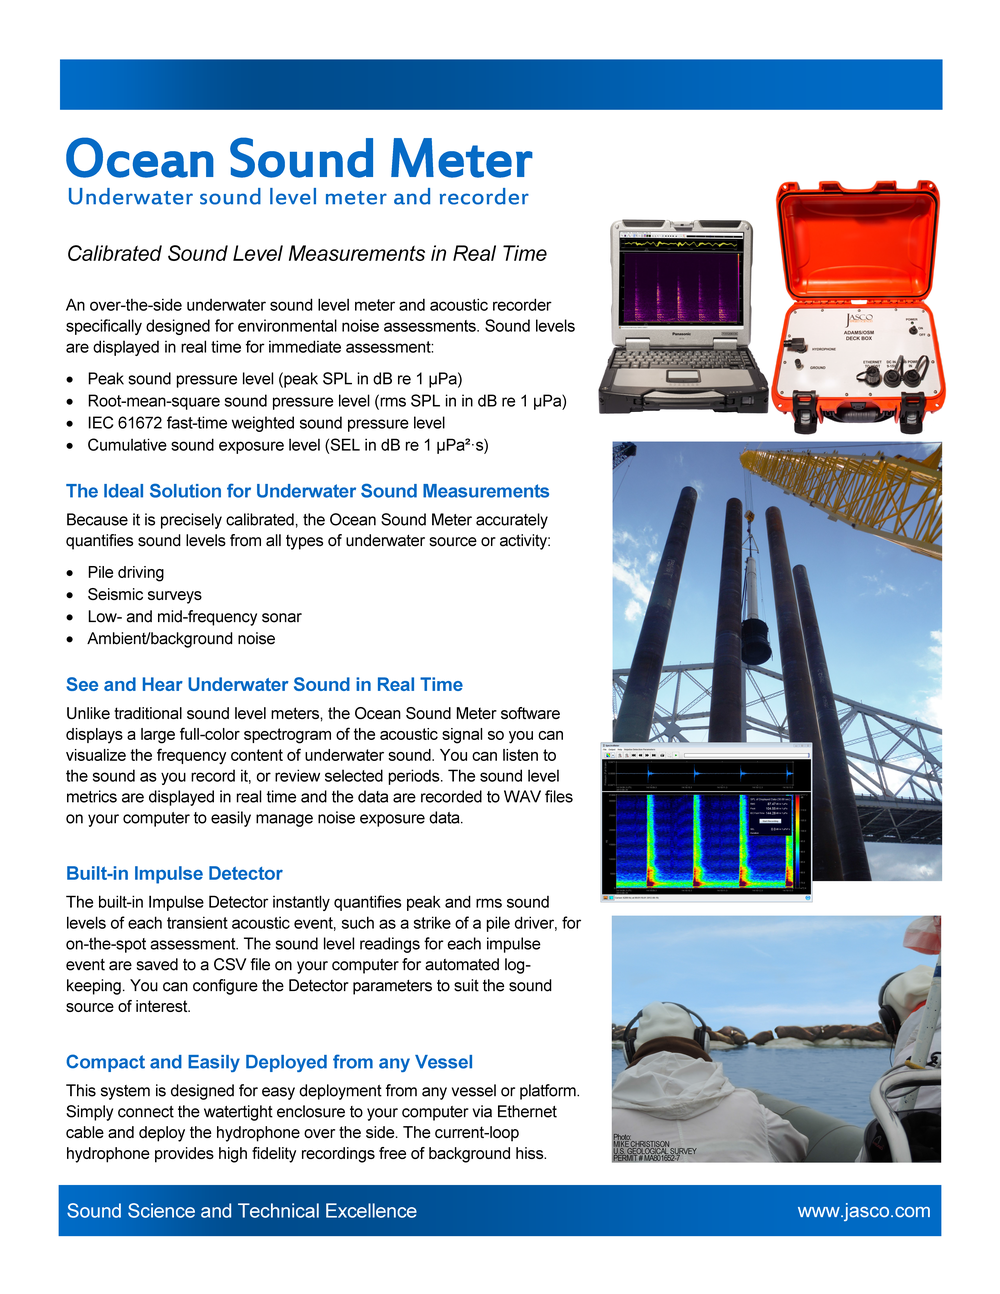 Ocean Sound Meter (OSM) Letter size (PDF) A4 size (PDF)